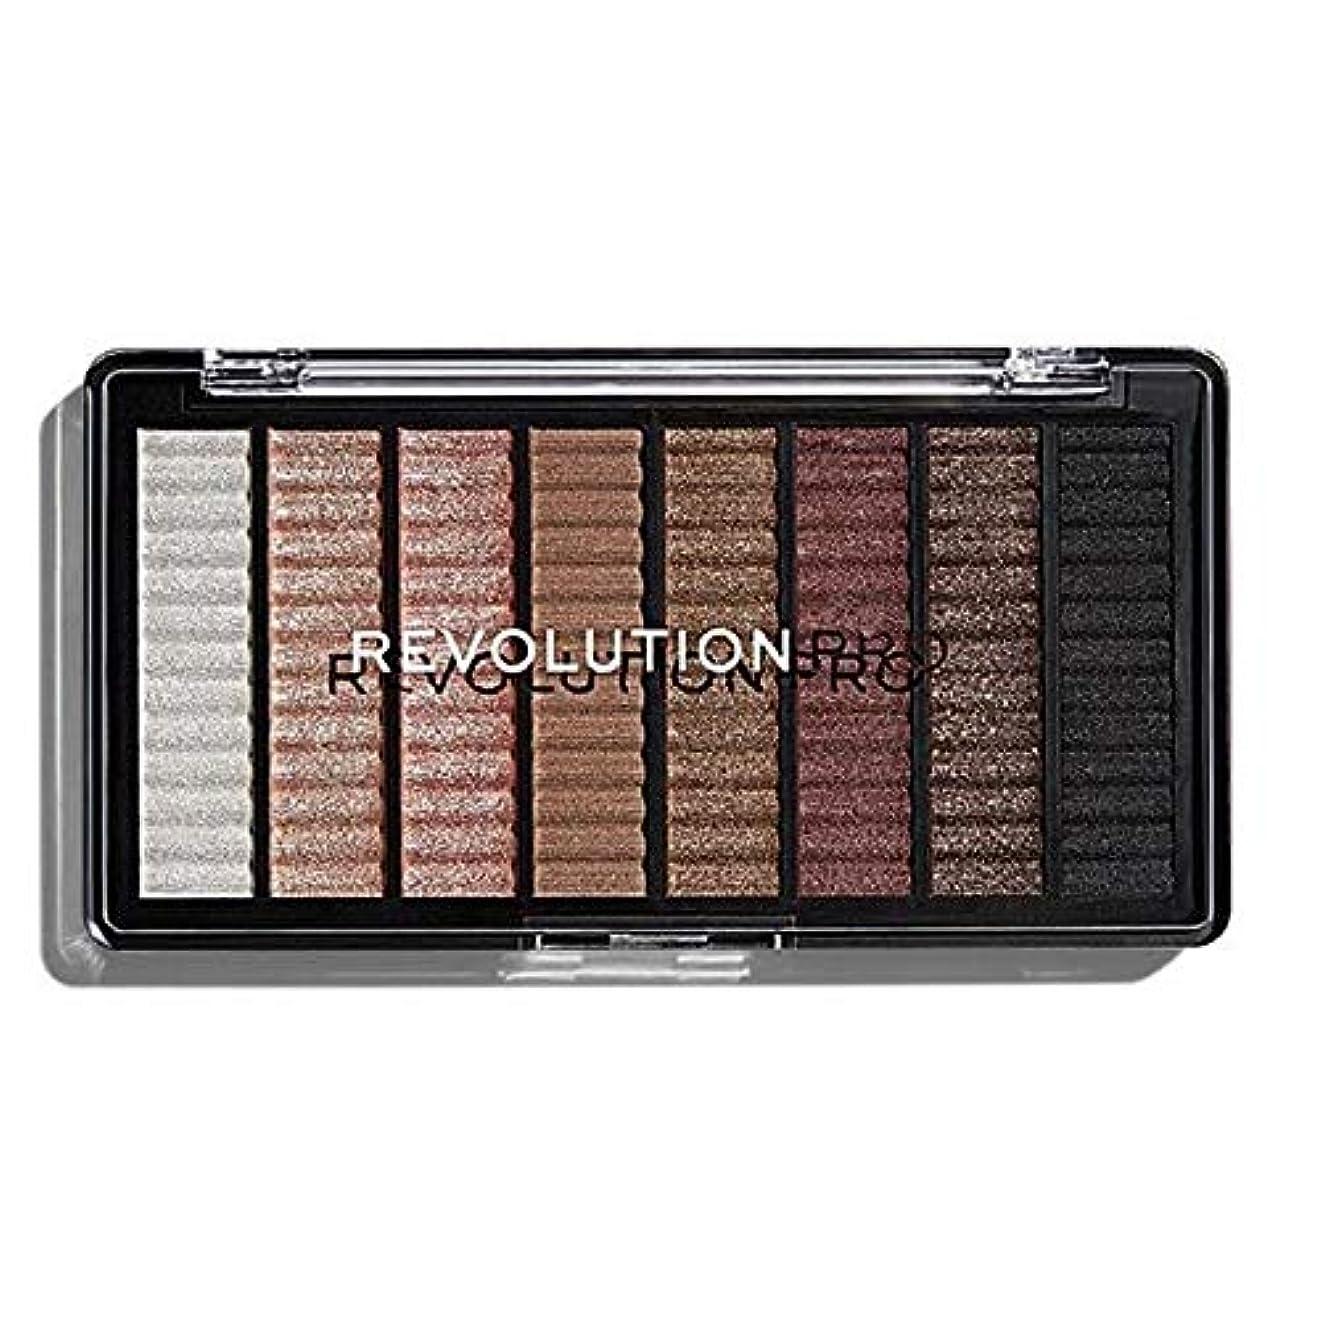 [Revolution ] 革命プロ最高のCaptivateアイシャドウパレット - Revolution Pro Supreme Captivate Eye Shadow Palette [並行輸入品]